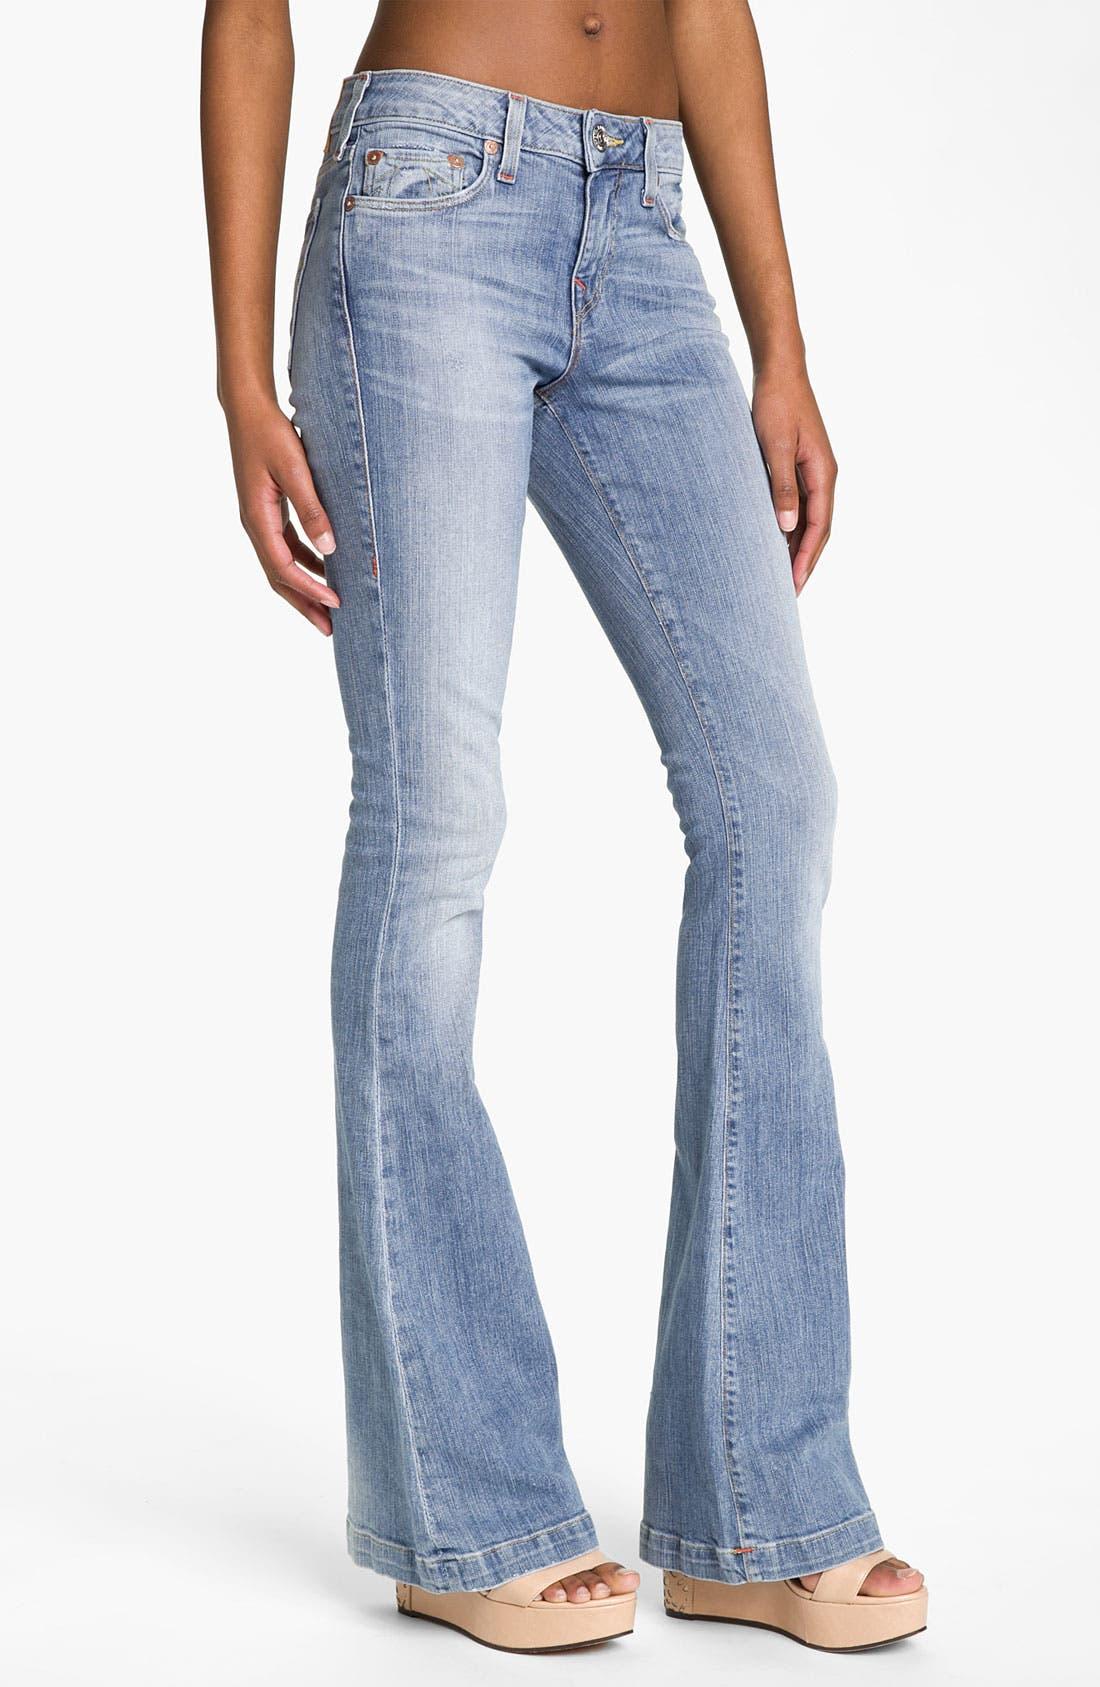 Alternate Image 1 Selected - True Religion Brand Jeans 'Emi'' Distressed Flare Leg Jeans (Medium Drifter)